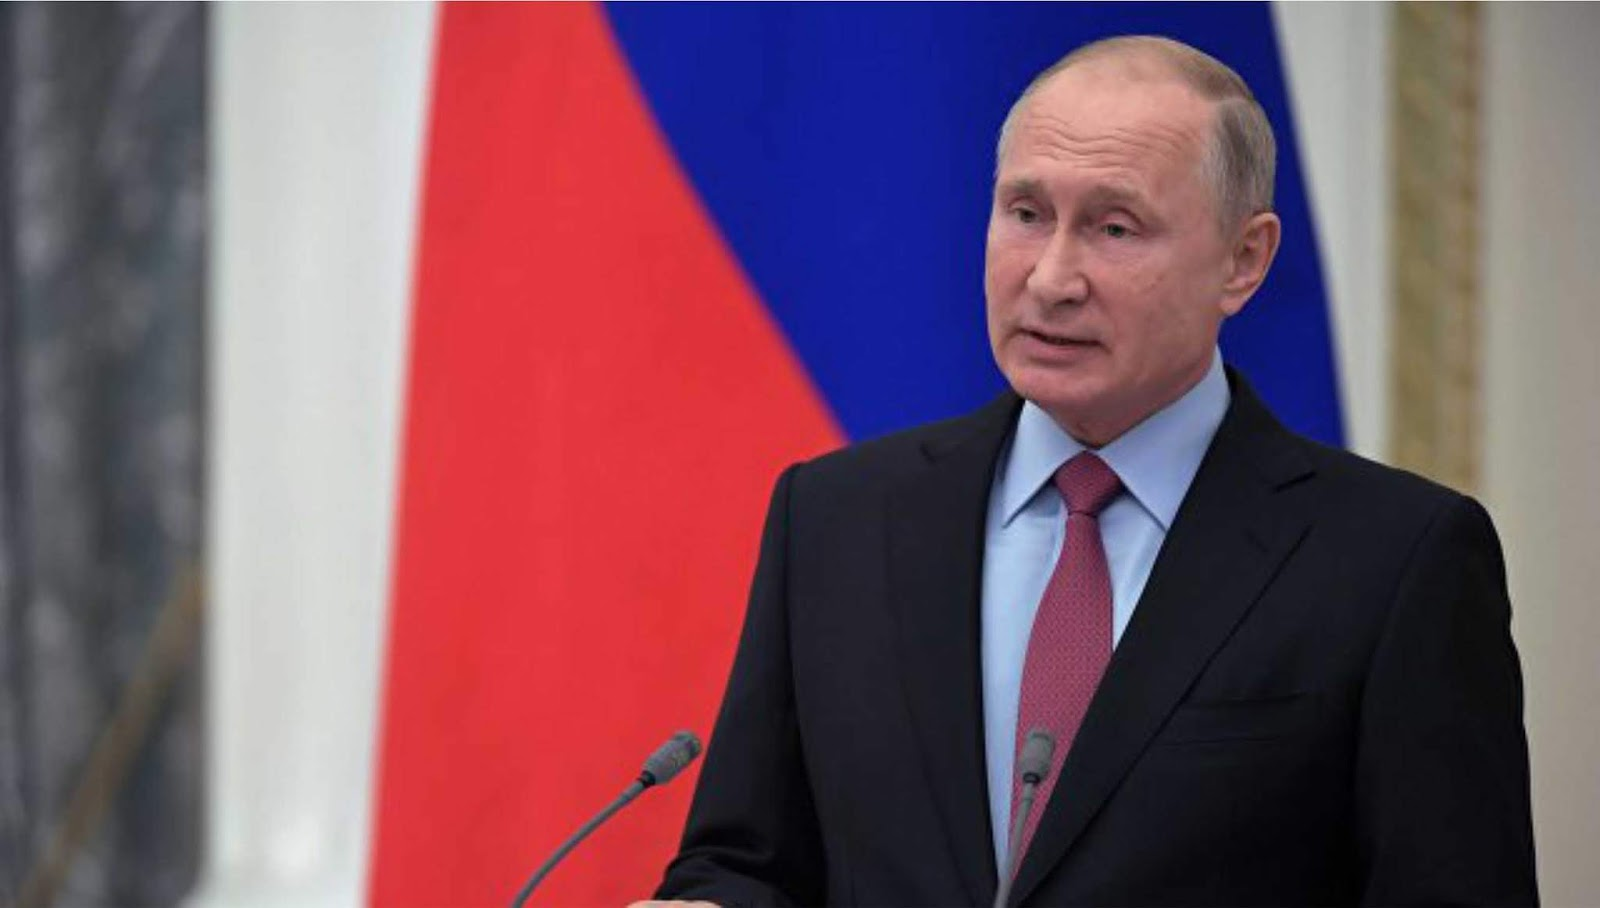 Putin - Keputusan AS untuk menarik diri dari Perjanjian INF tidak akan tanpa jawaban